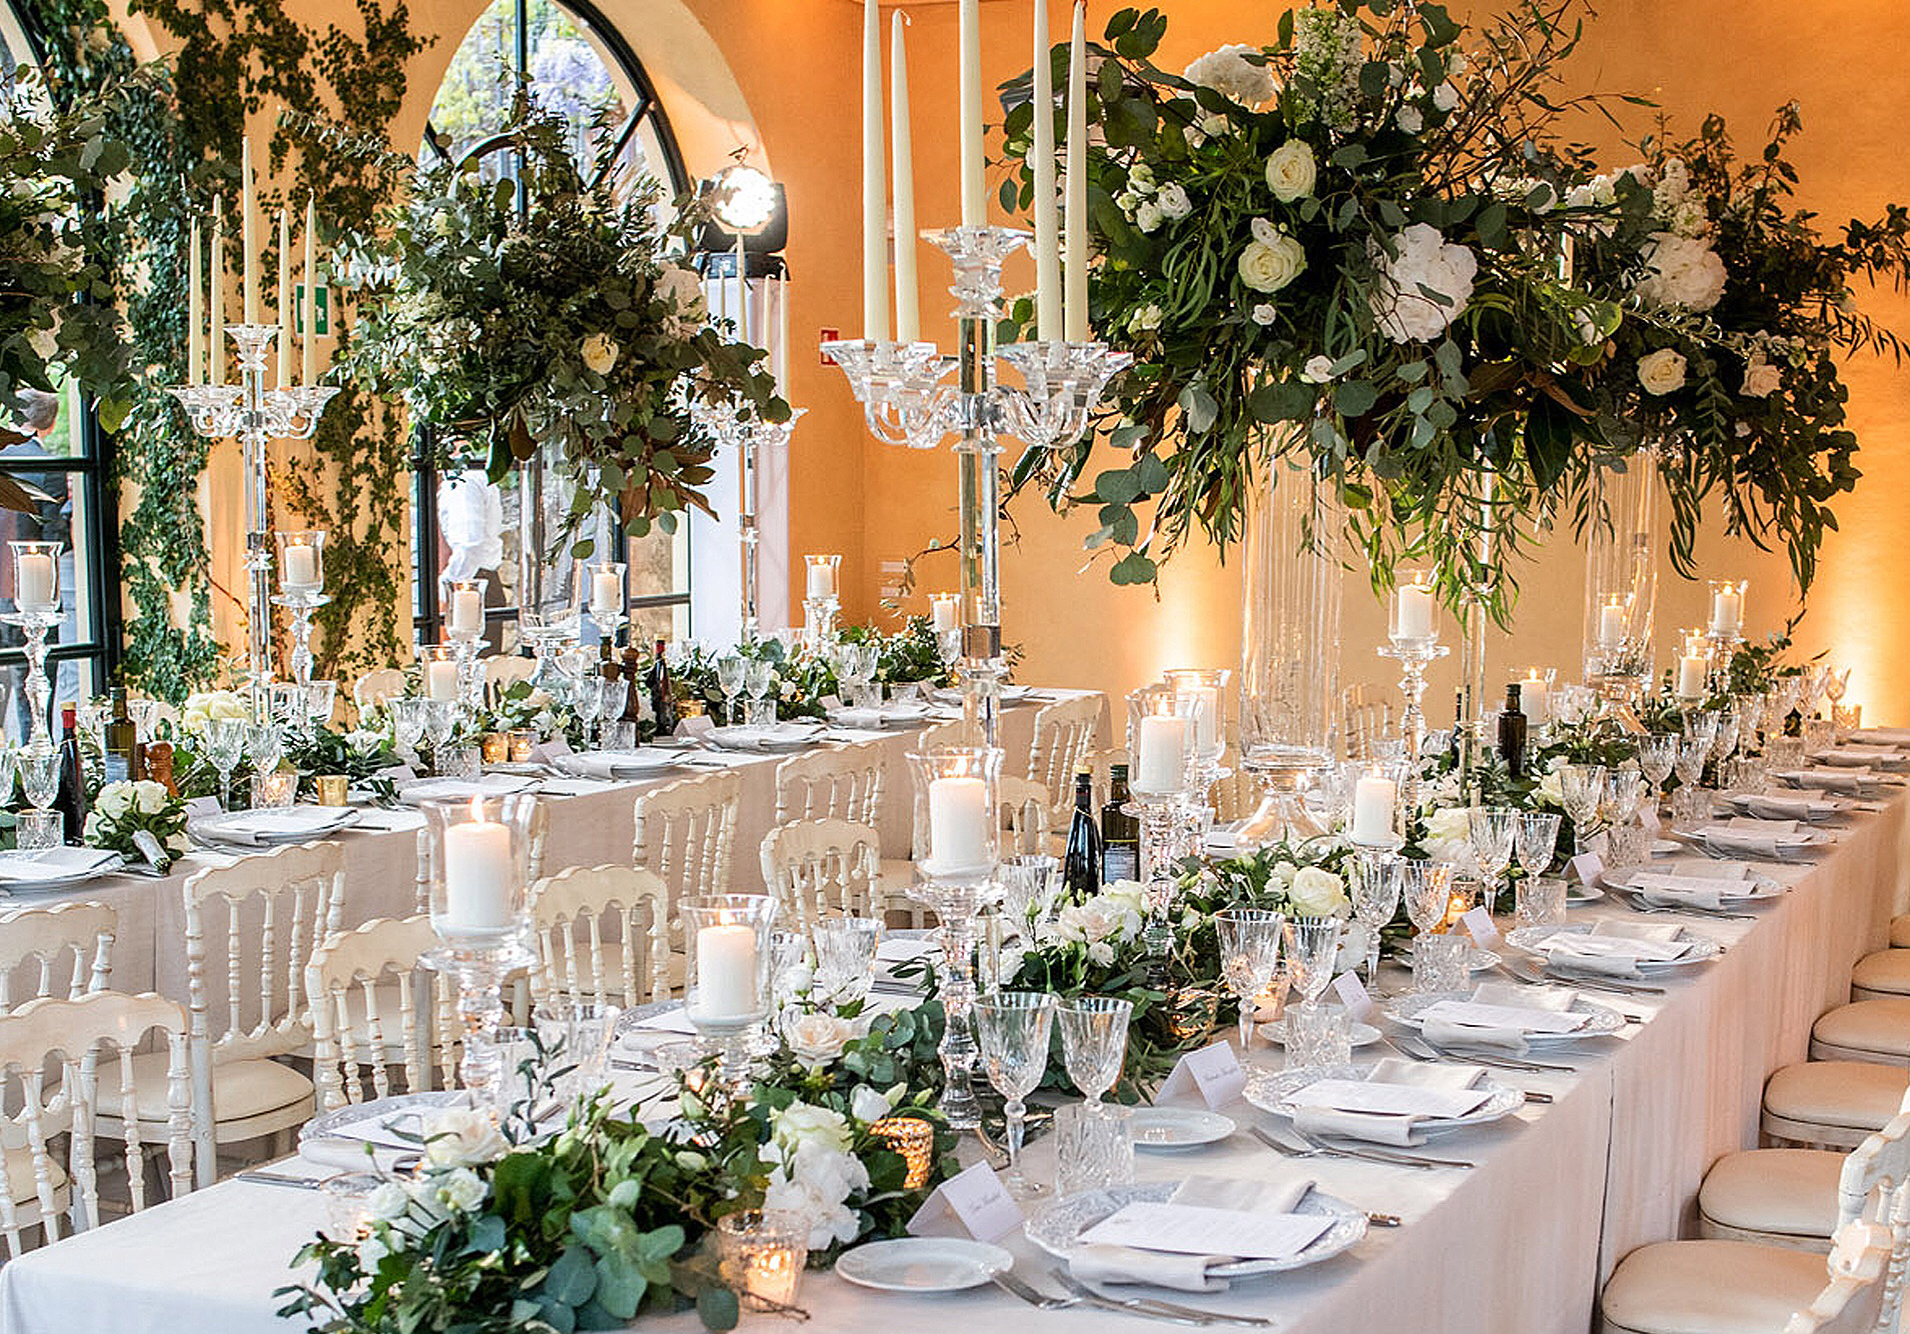 Evening-wedding-reception-at-Villa-Balbianello-weddings-planned-by-My-Lake-Como-Wedding